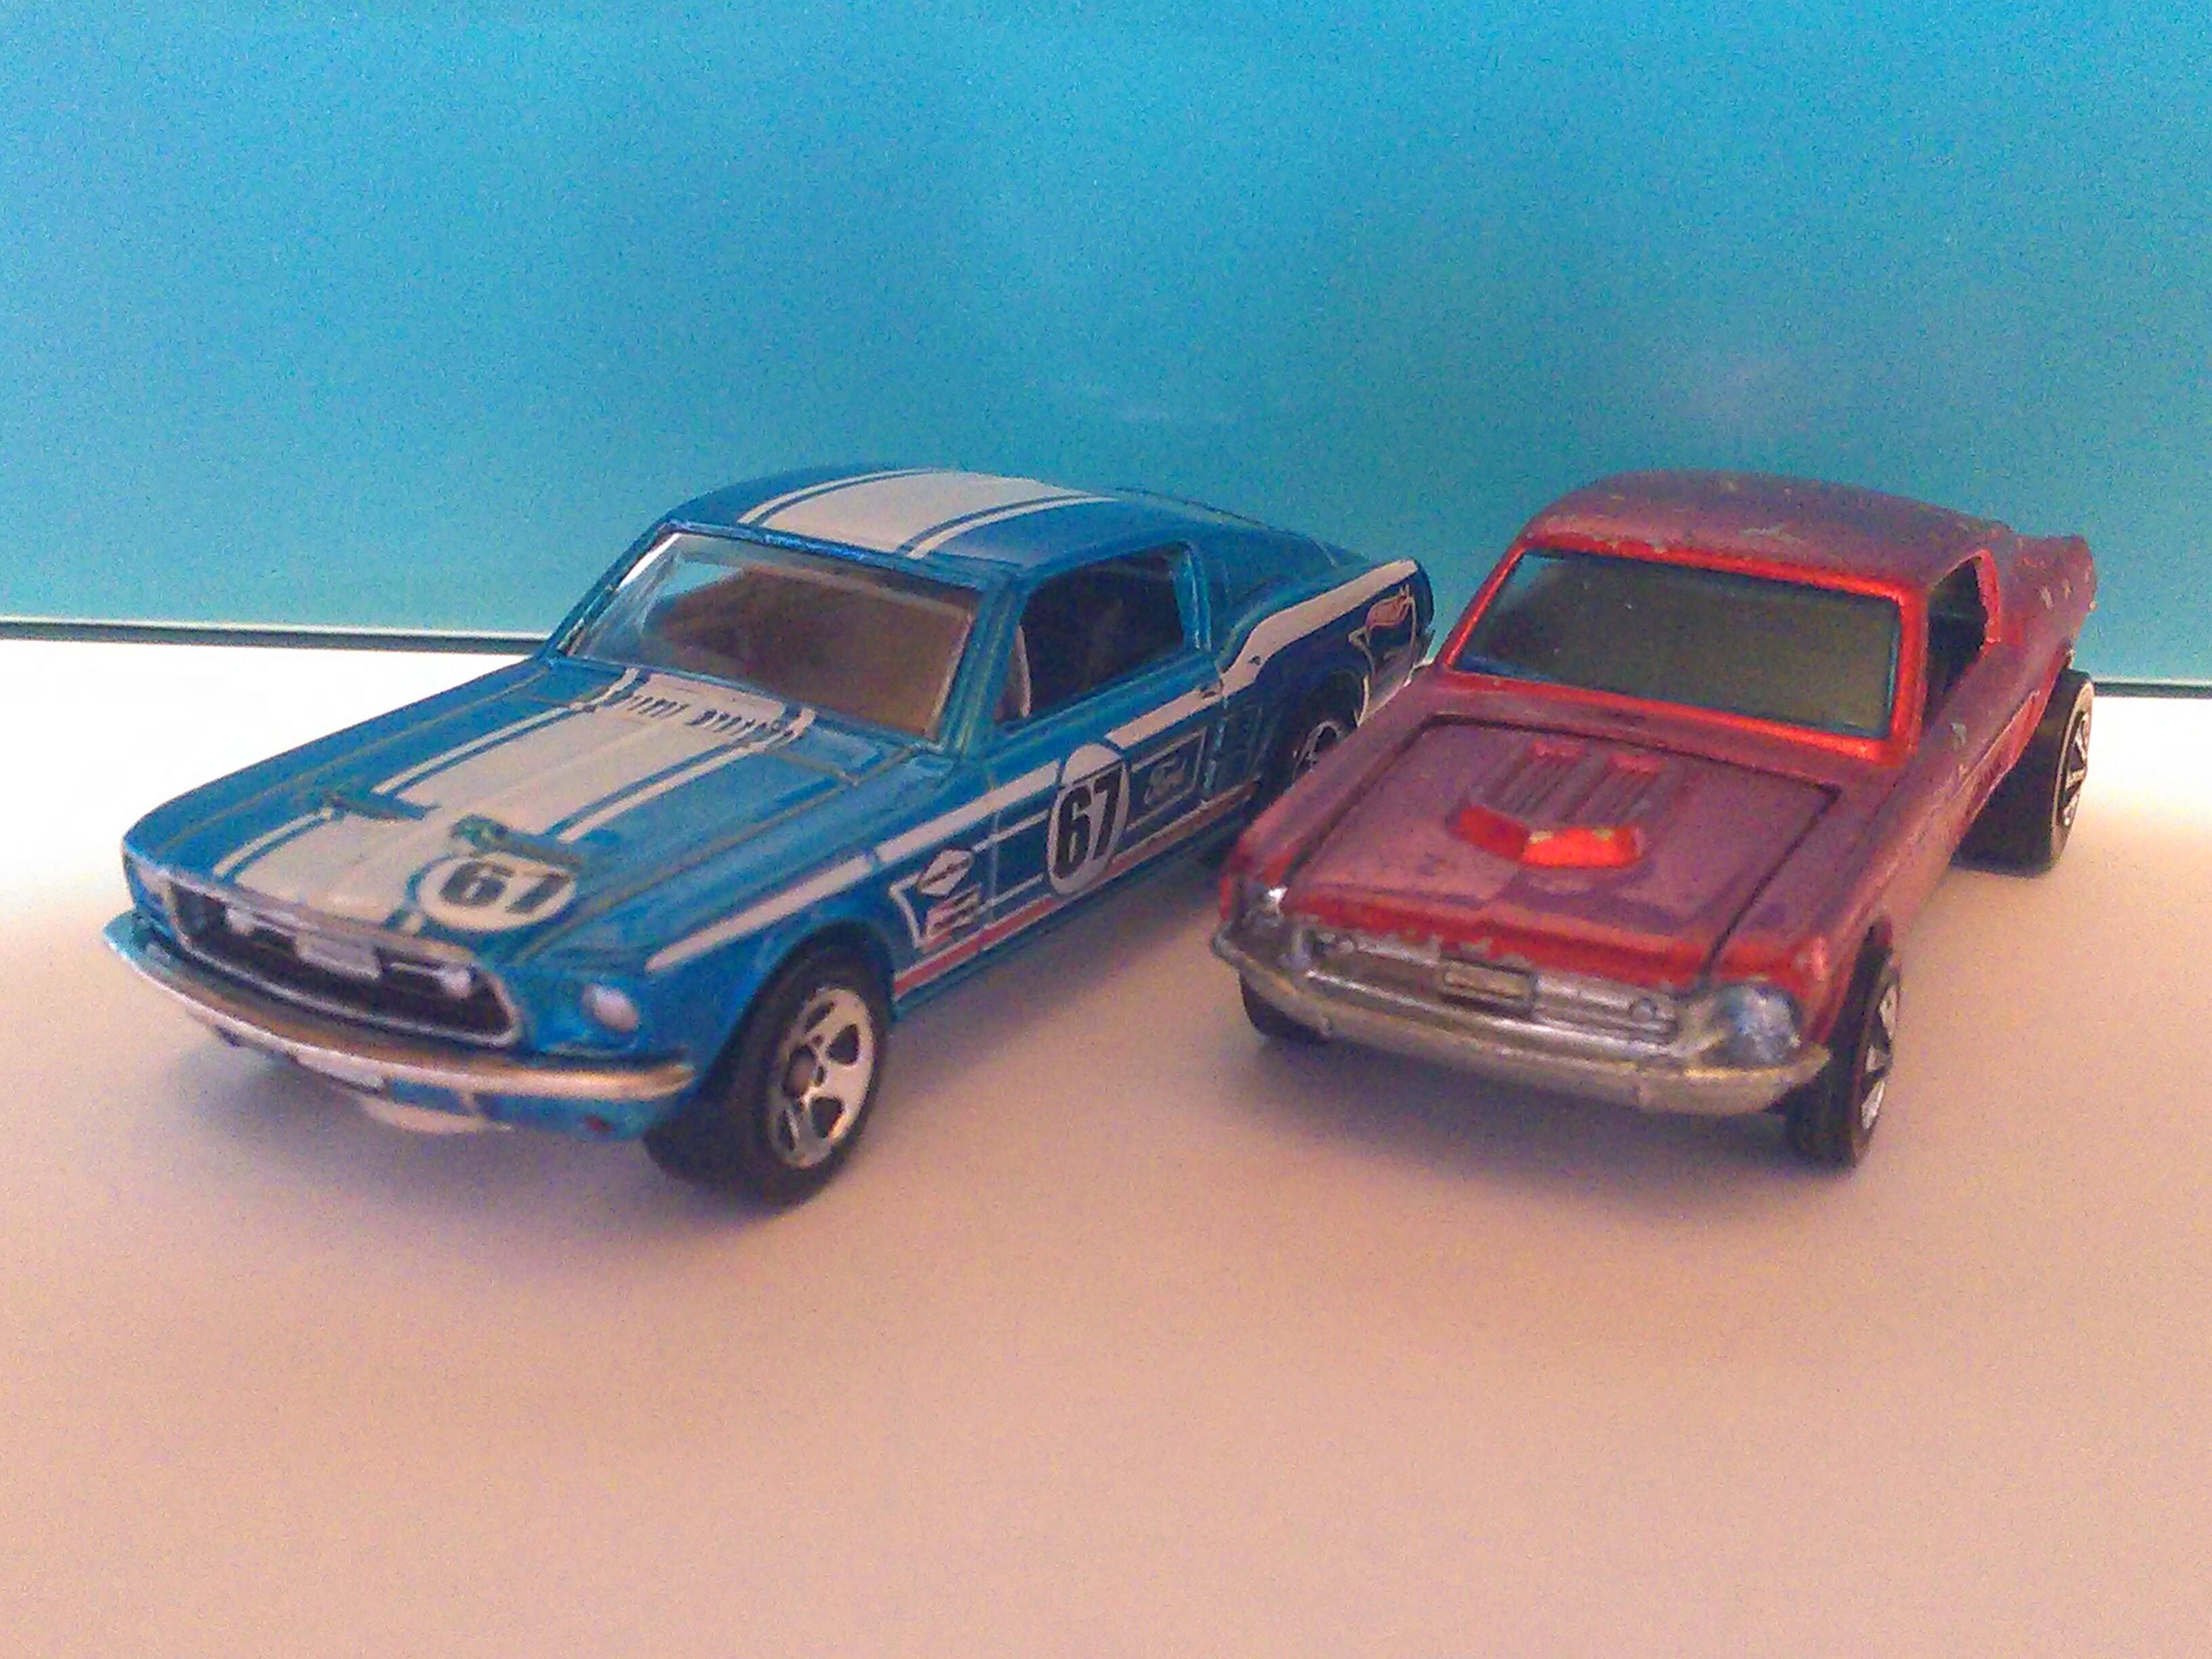 '67 Mustang